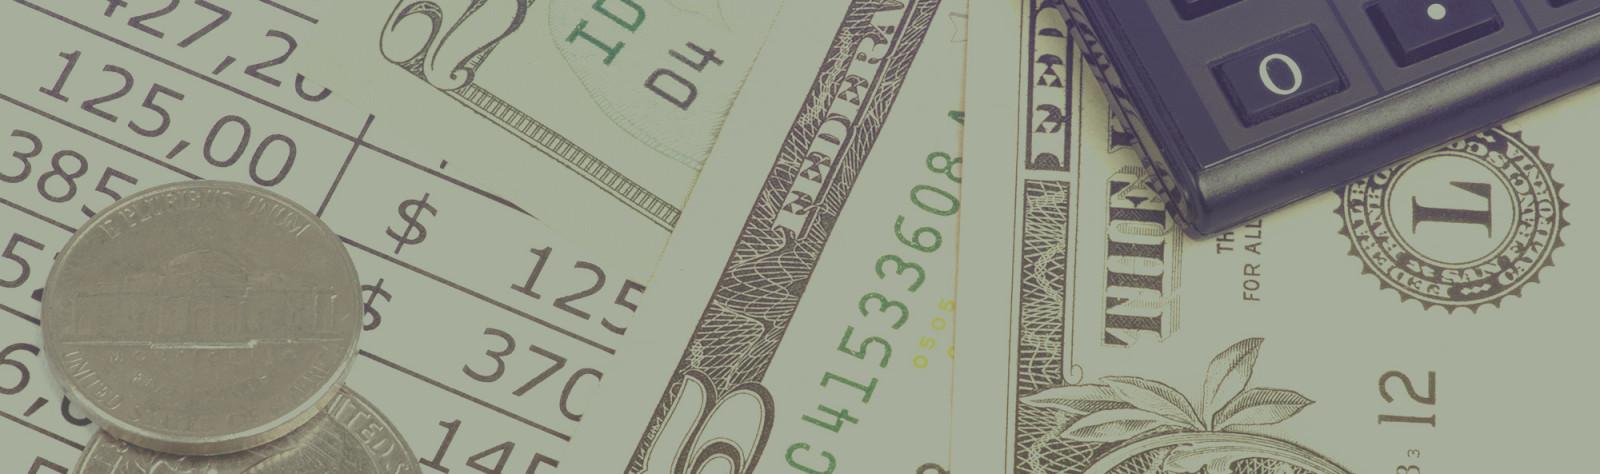 ccwestmi banner payee 1600x474 - Finances